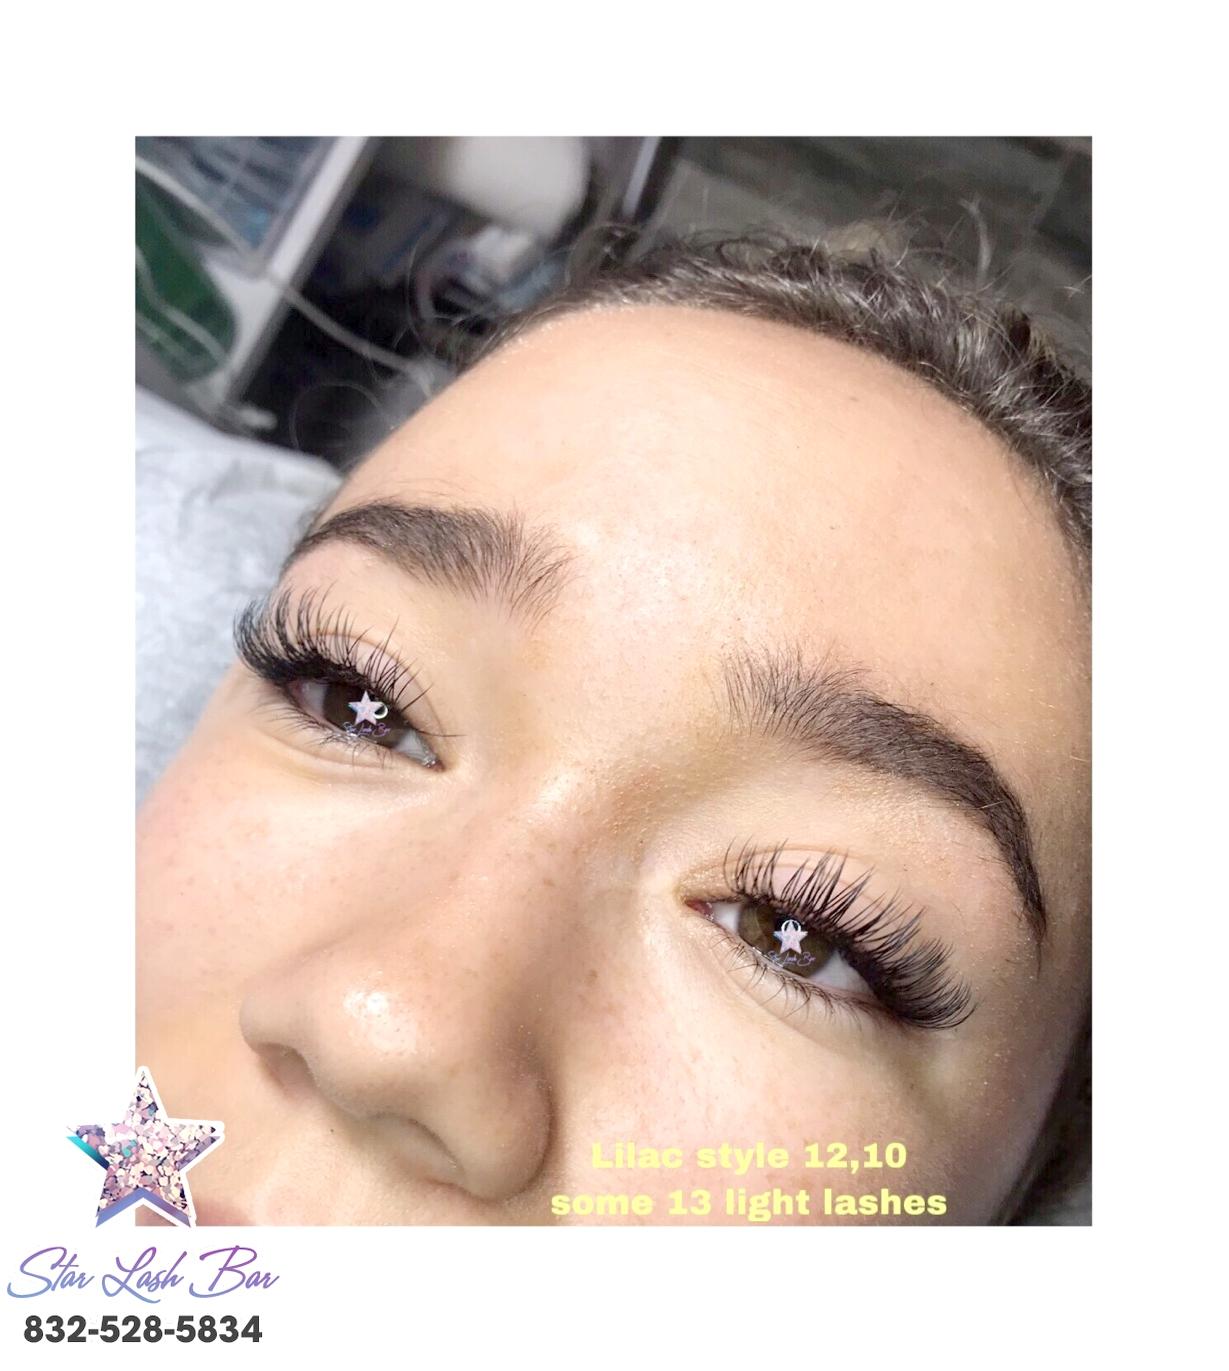 Star Lash Bar - Eyelash Extensions in Houston, TX 77098